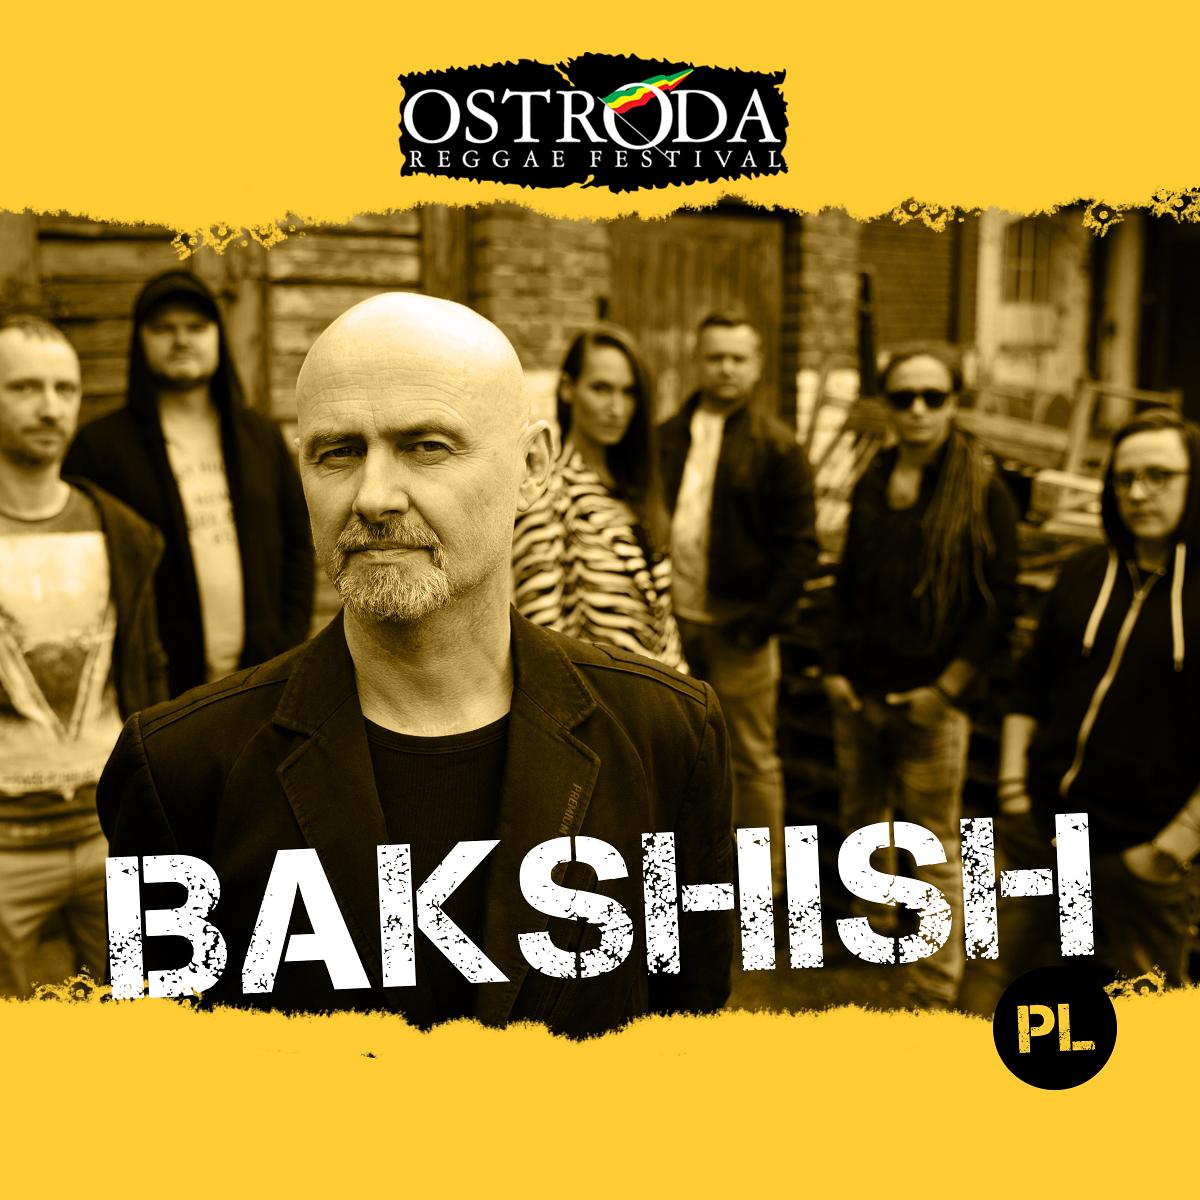 BAKSHISH (Polska)